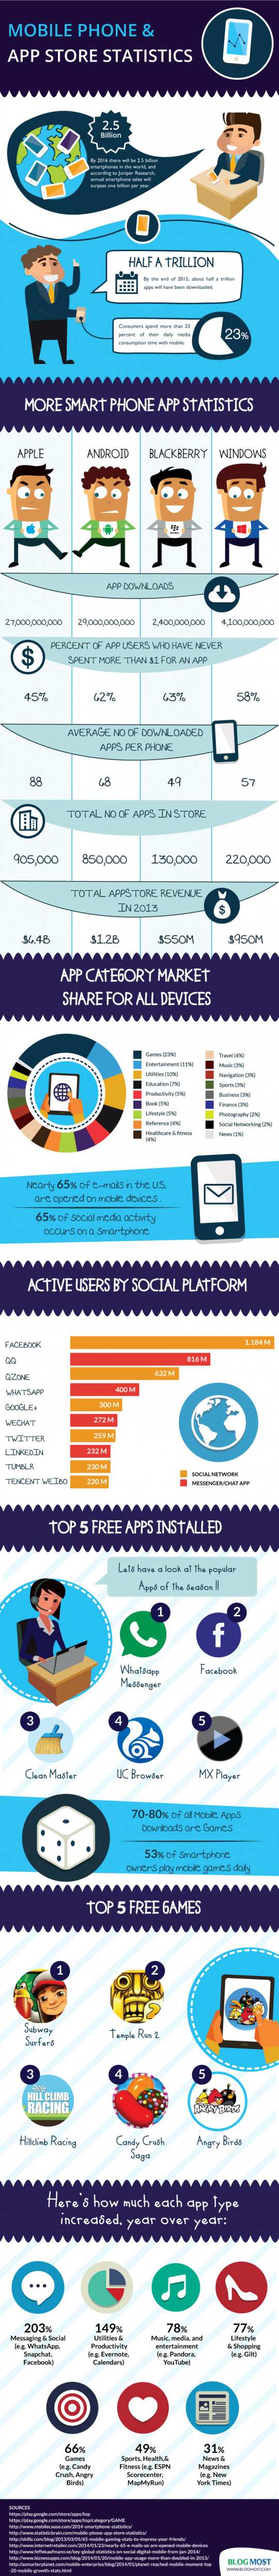 Mobile Phone & App Store Statistics